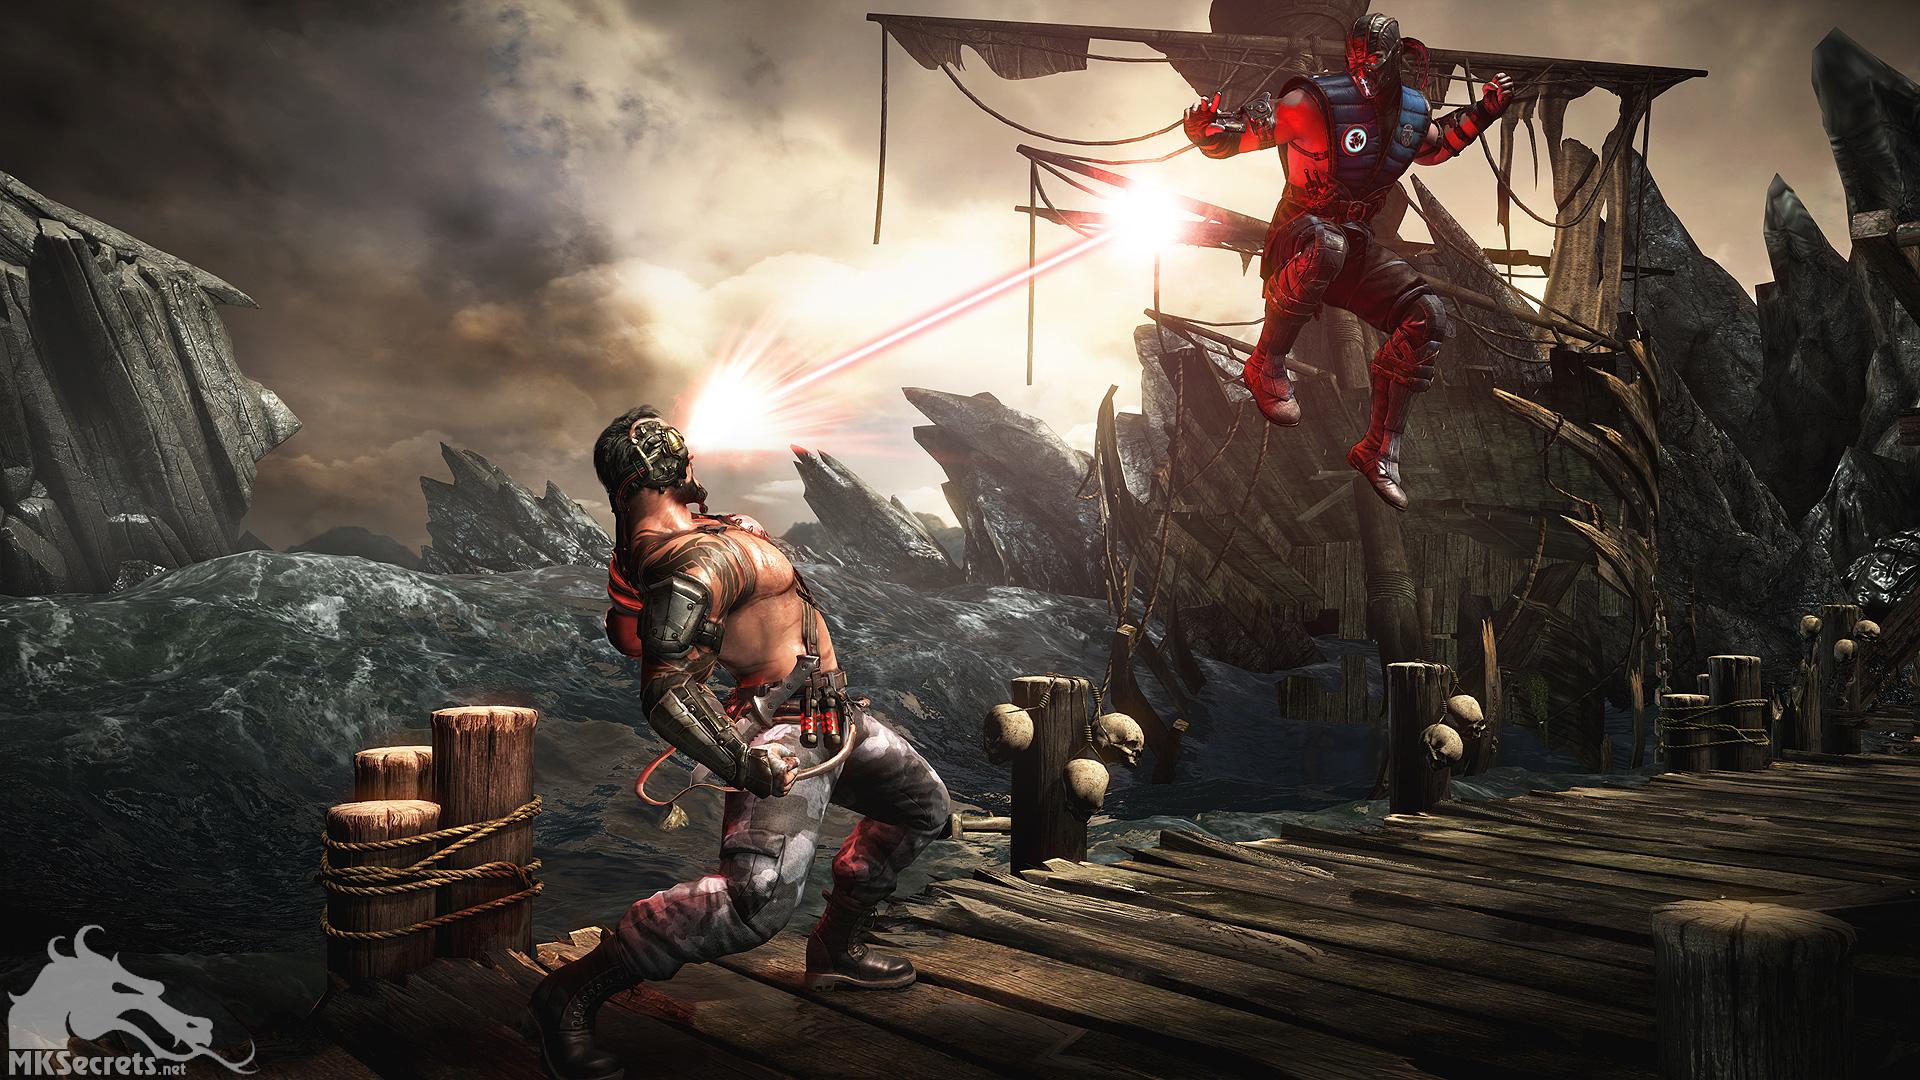 Mortal Kombat 11 - 4K PC Screenshots Gallery